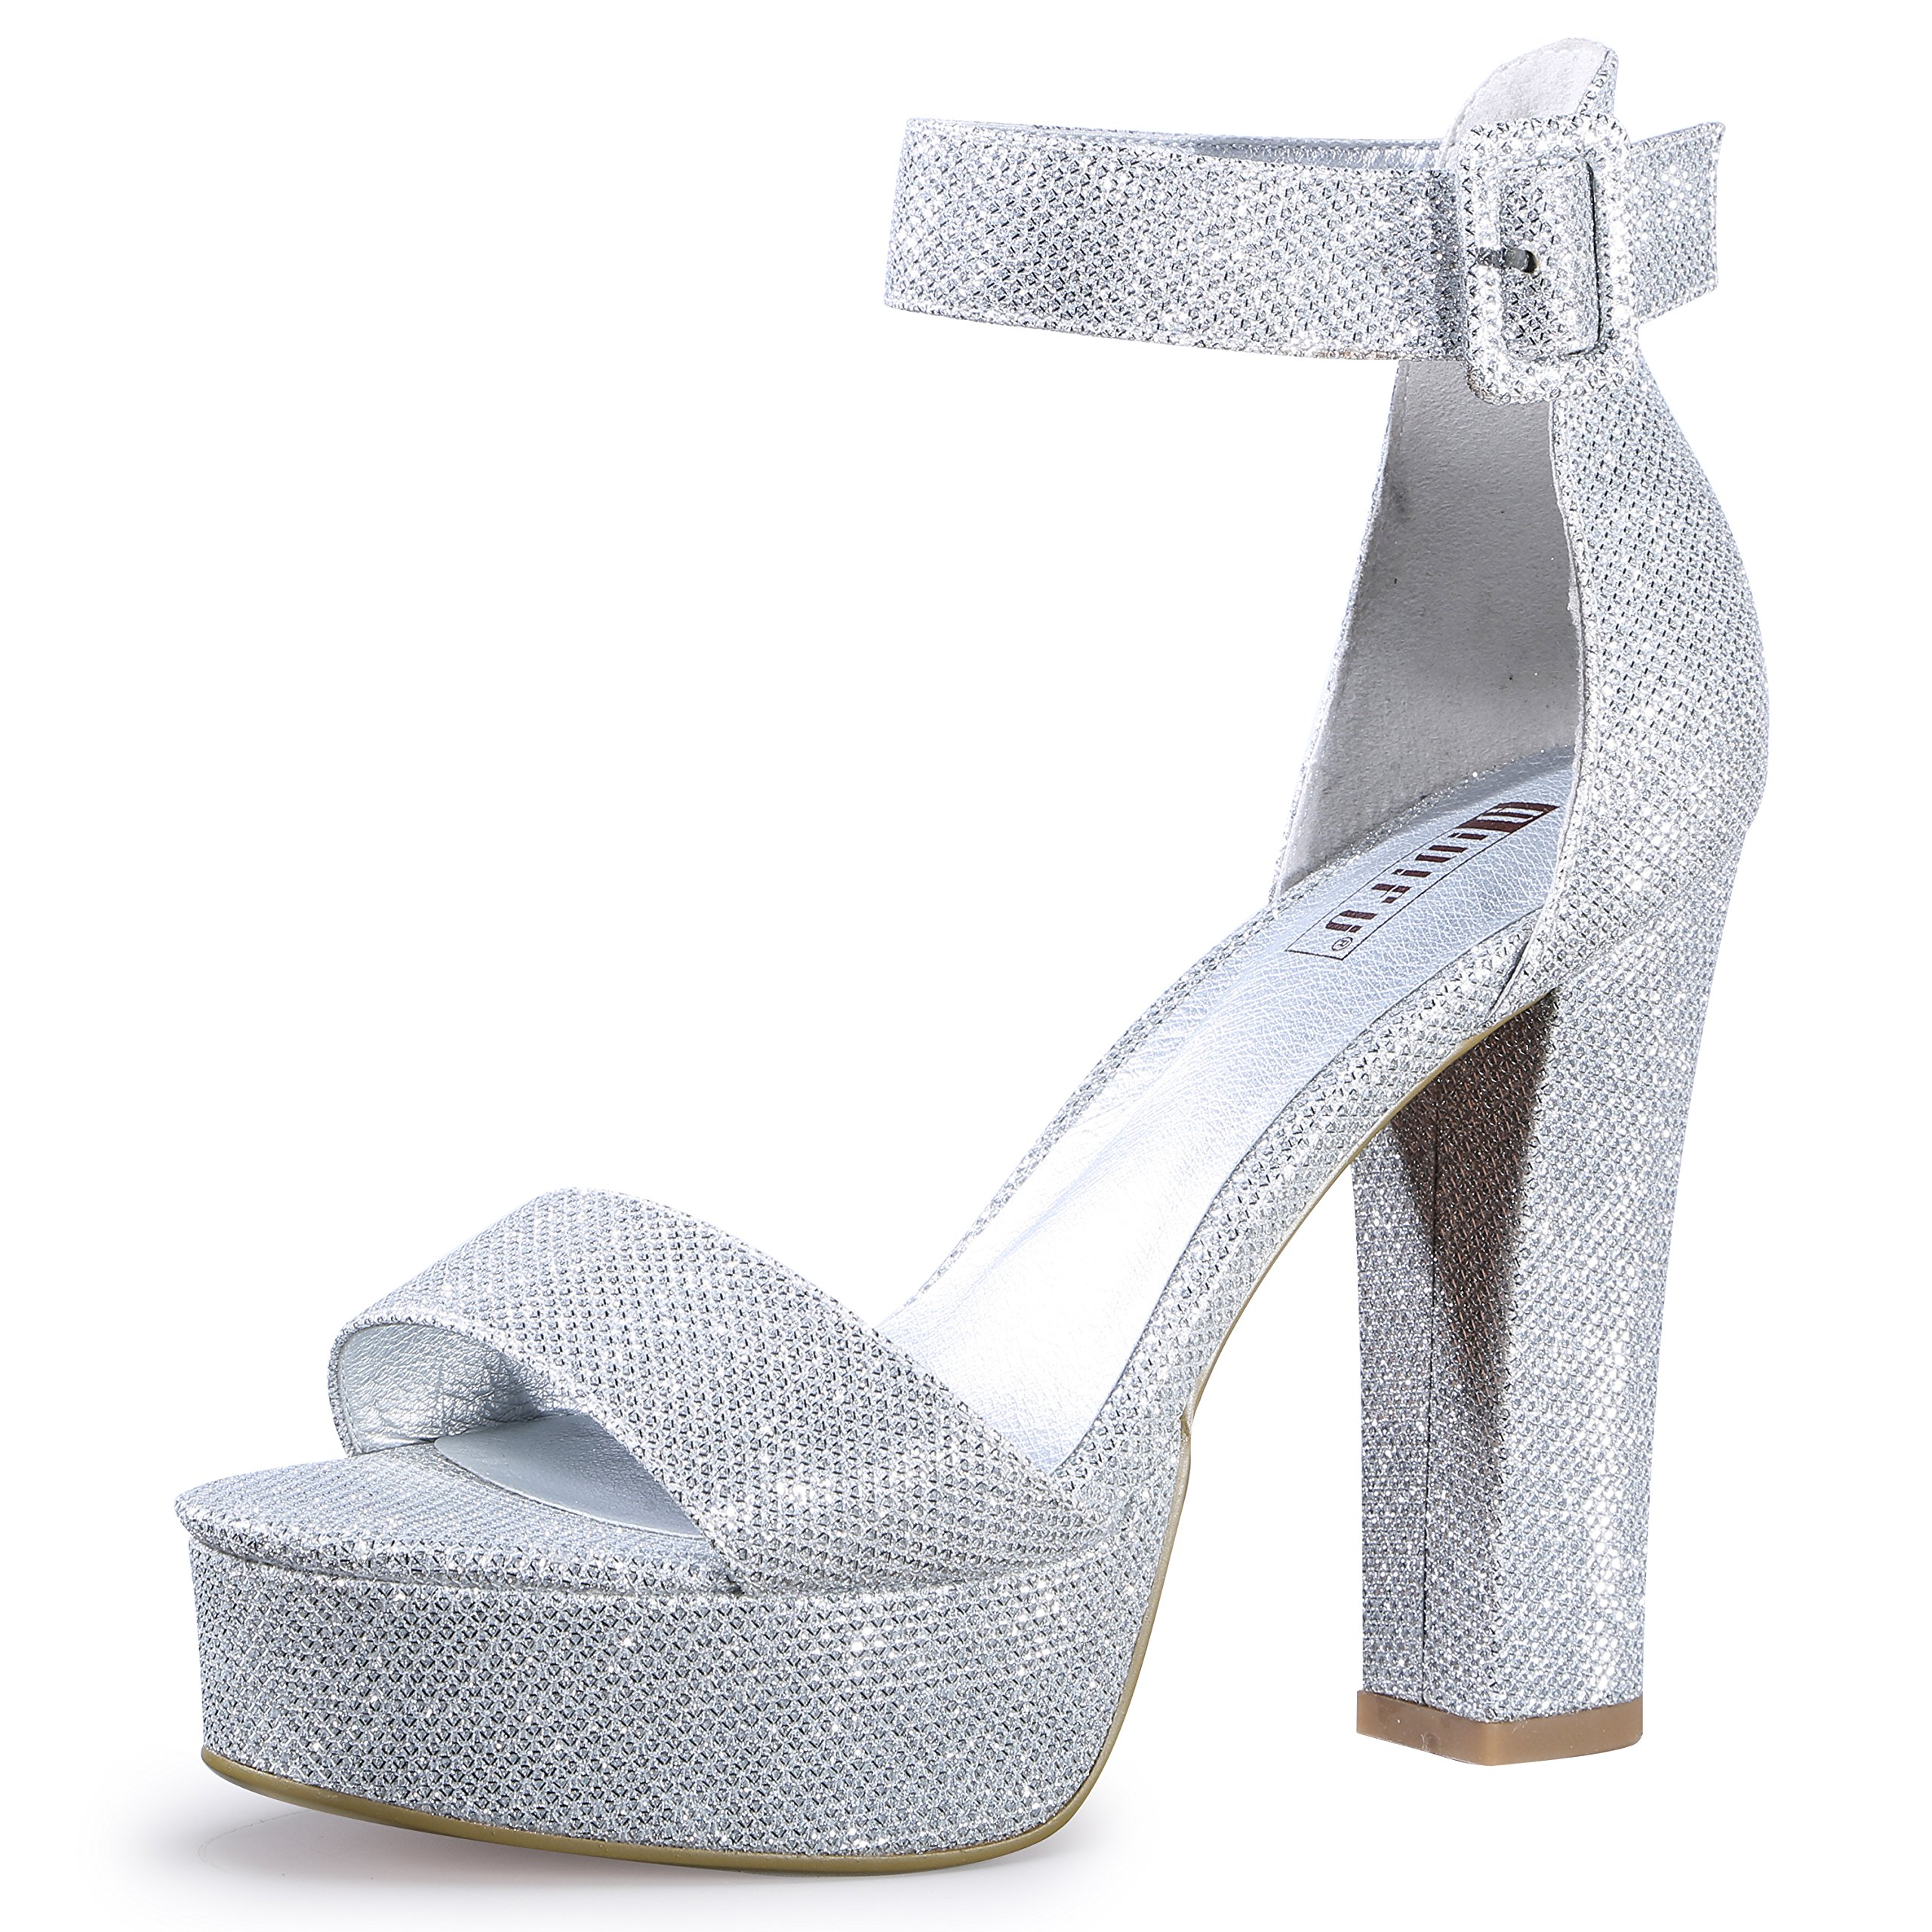 IDIFU Women's IN5 Sabrina Ankle Strap Platform High Chunky Heels Party Sandal (Silver Glitter, 6.5 B(M) US)